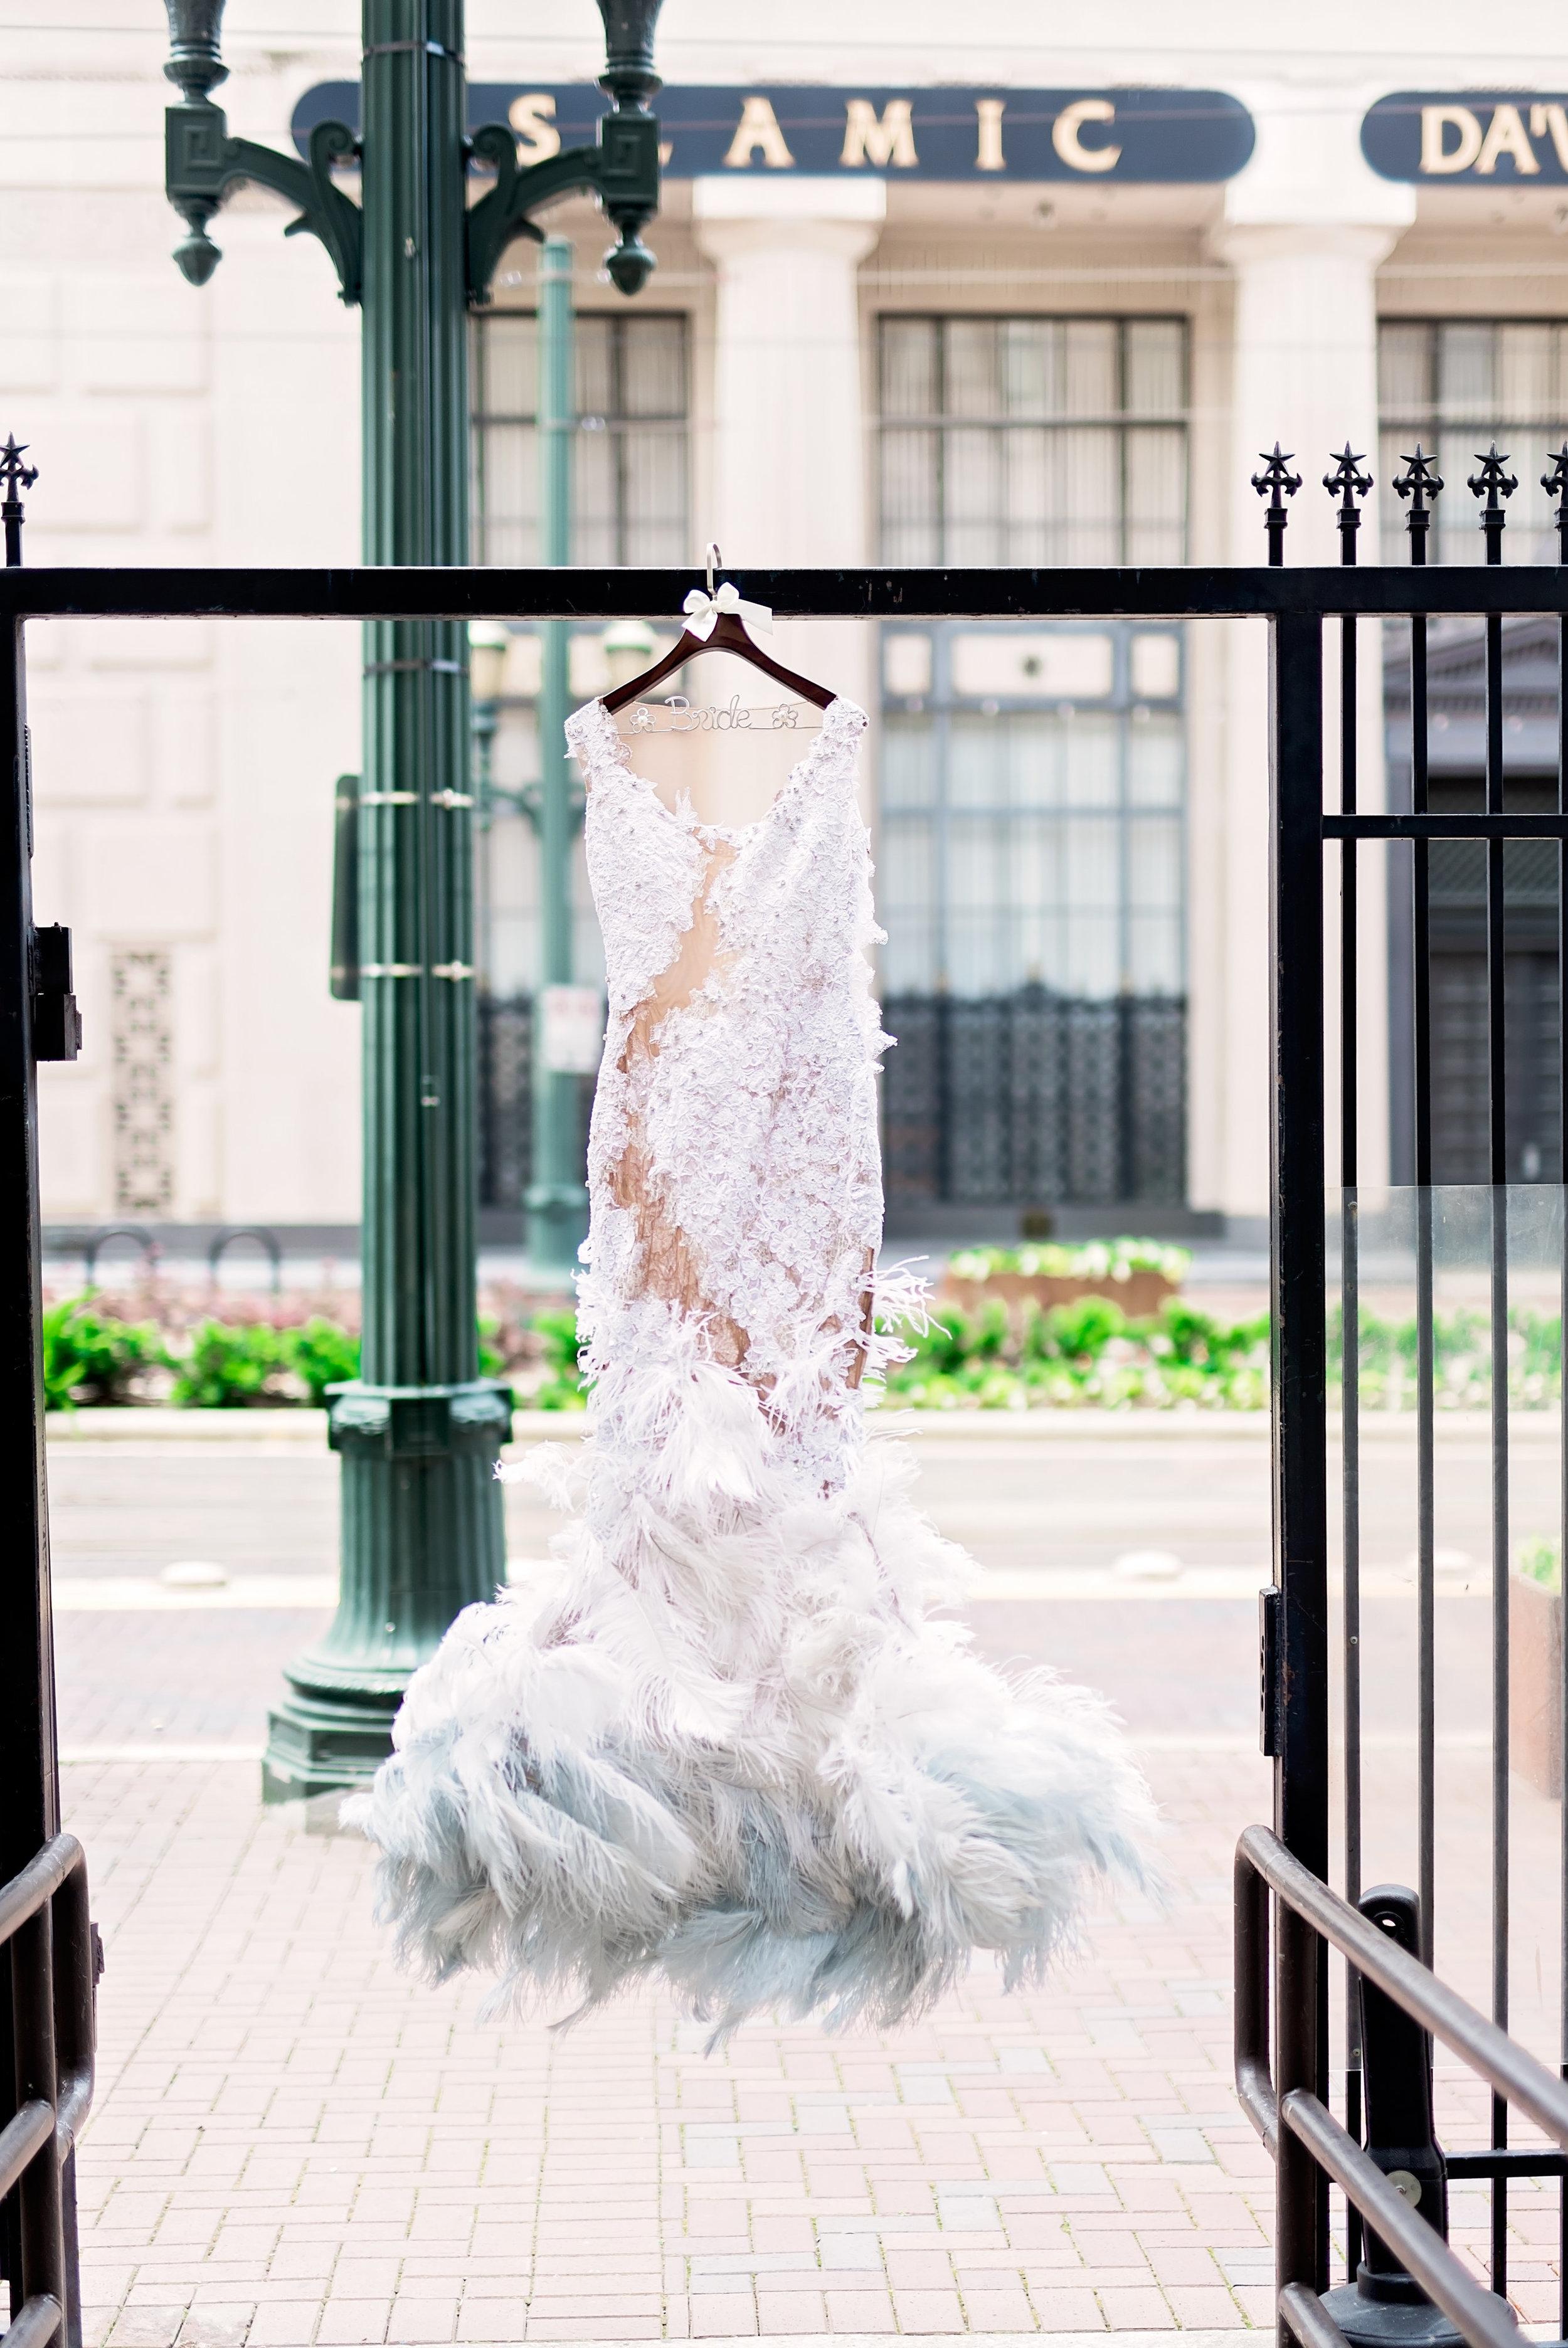 Pharris-Photos-Wedding-0001.jpg